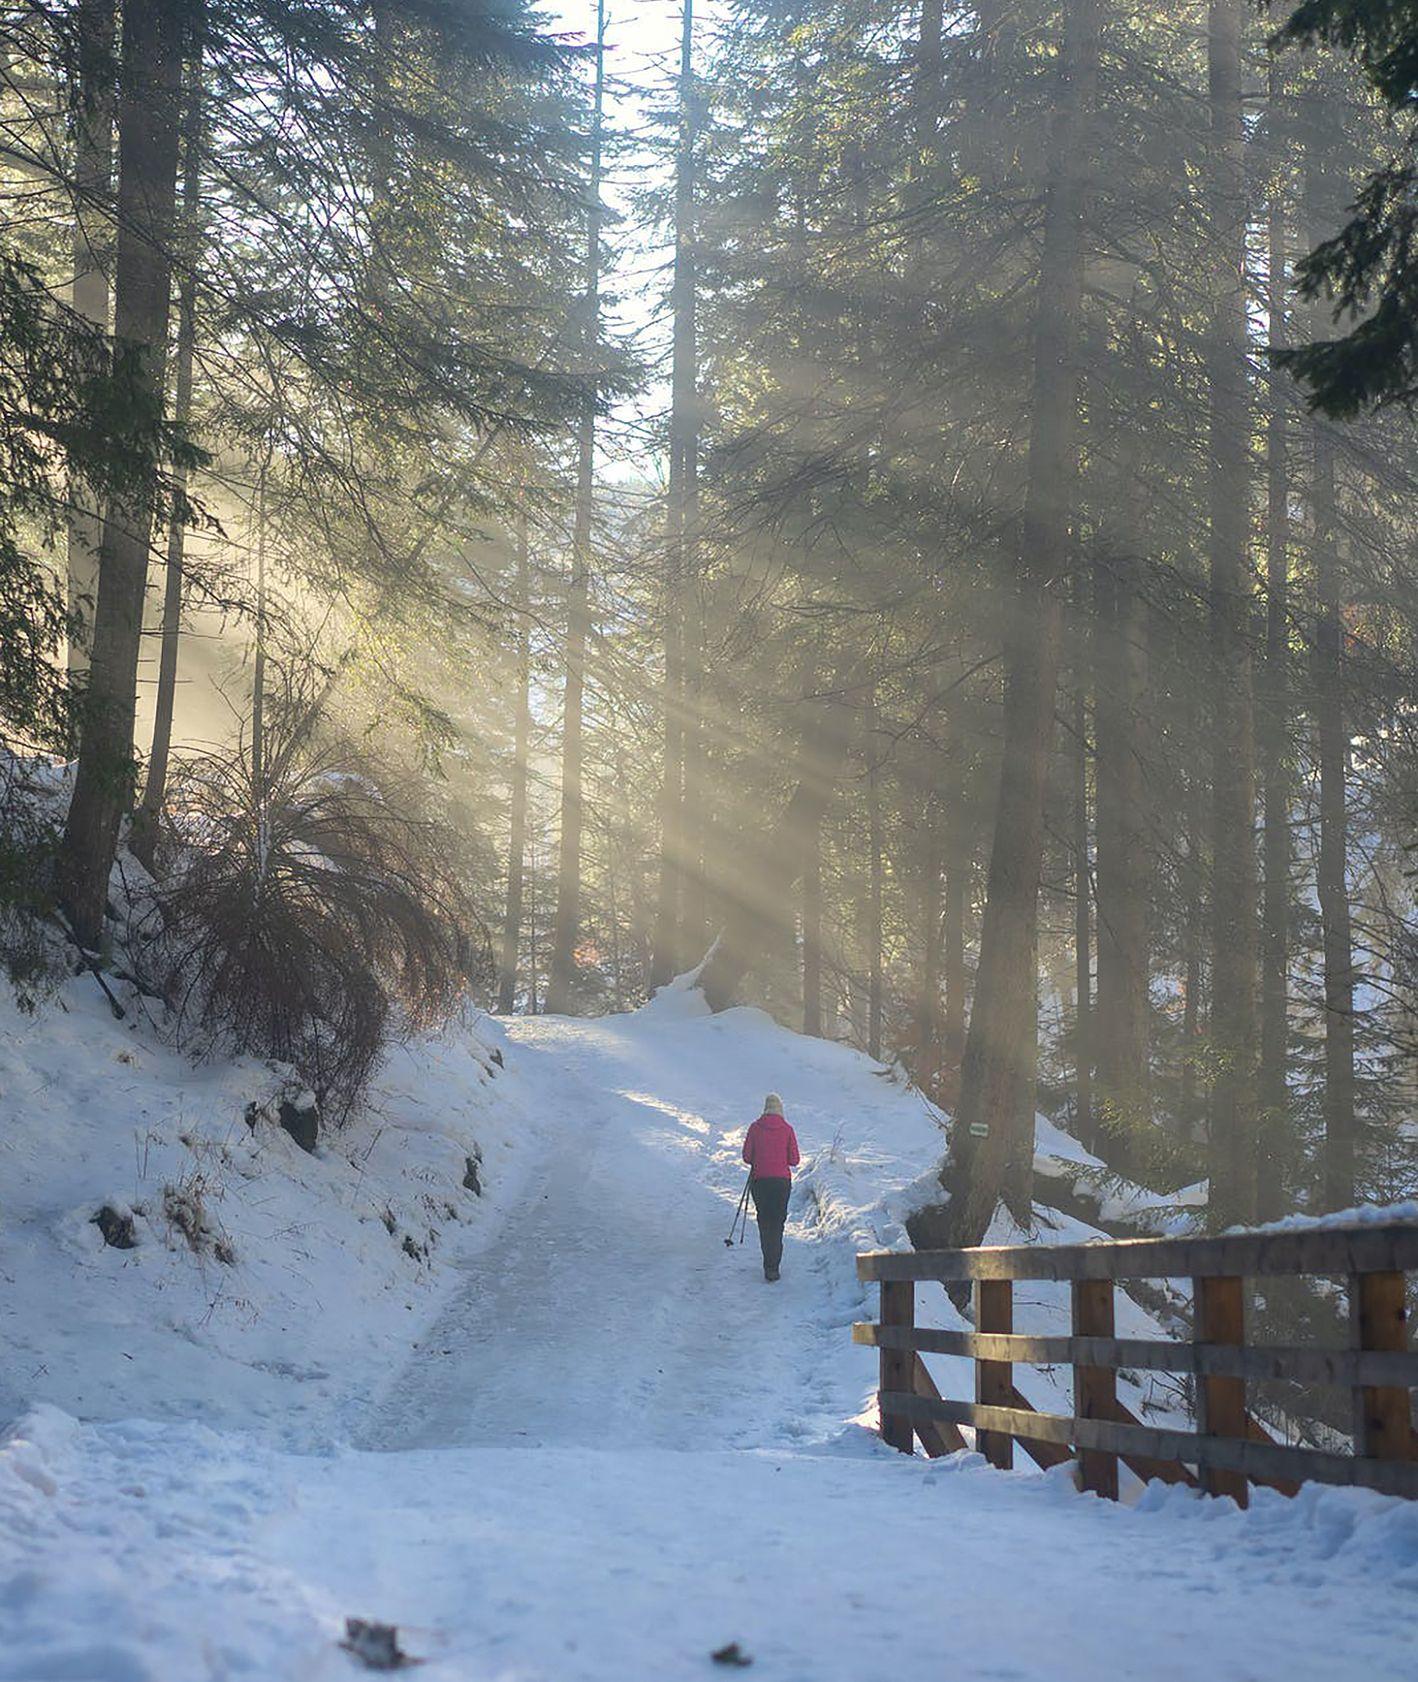 Plan na weekend. Spacer w lesie zimą. (fot. Alexandr Povalny / pexels.com)